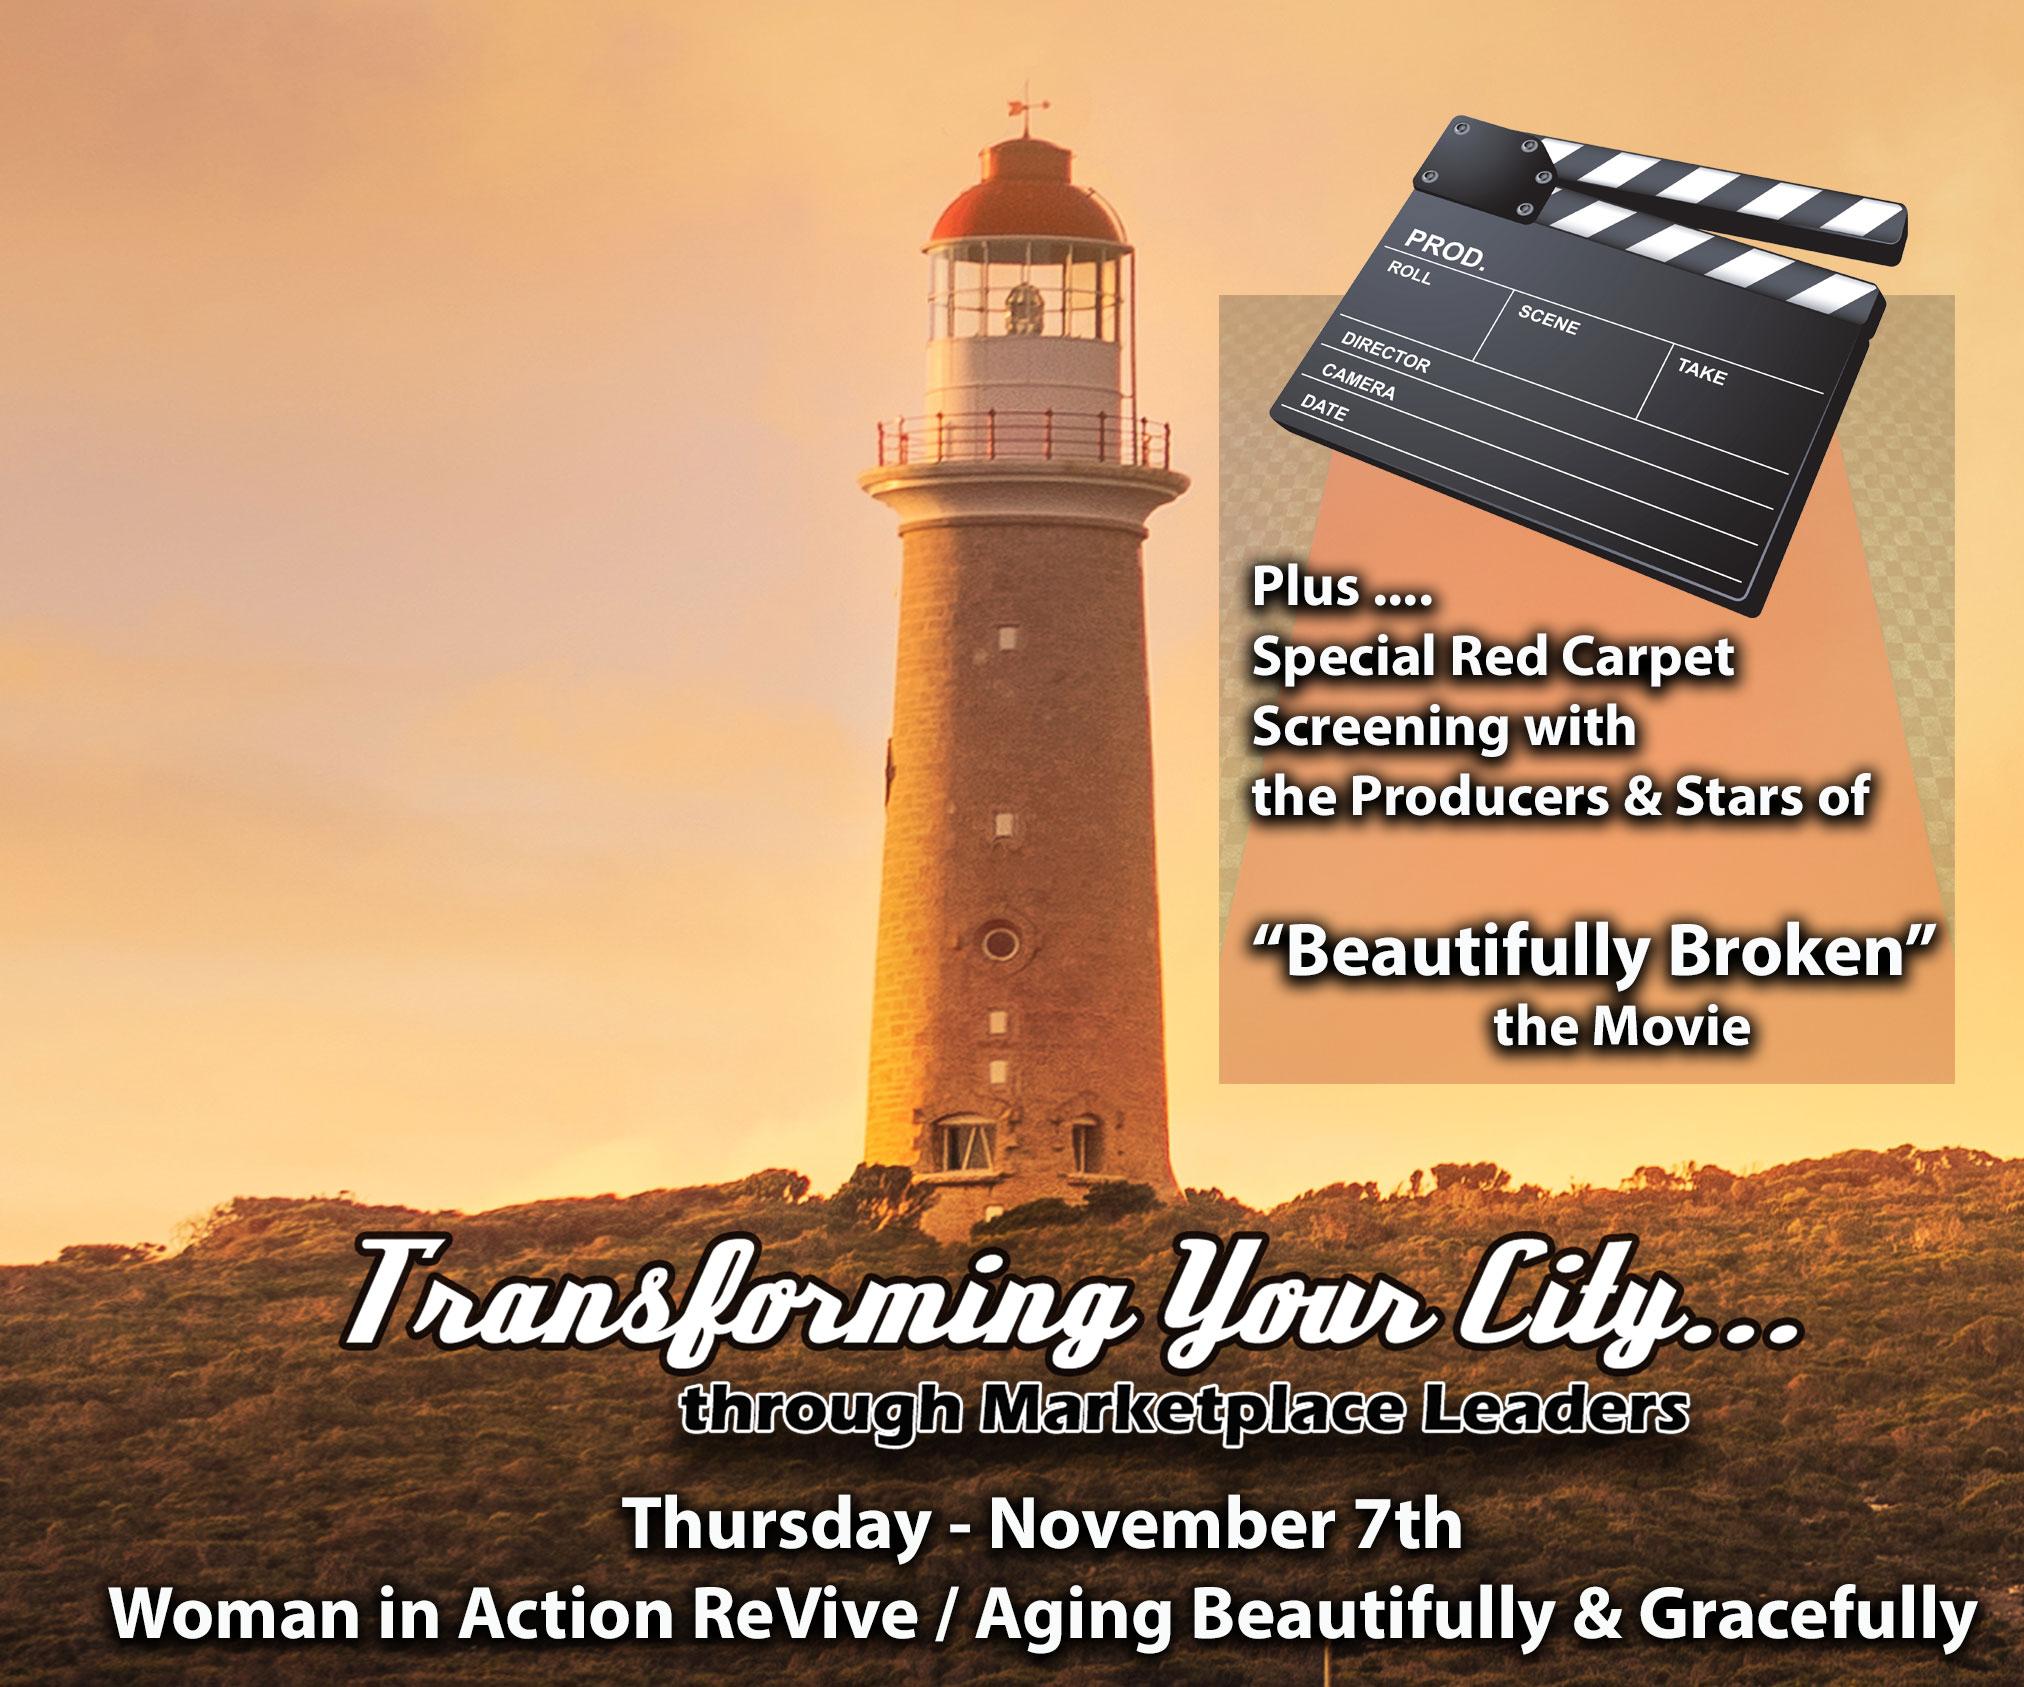 Thursday - November 7th - Marketplace Leadership Development Day